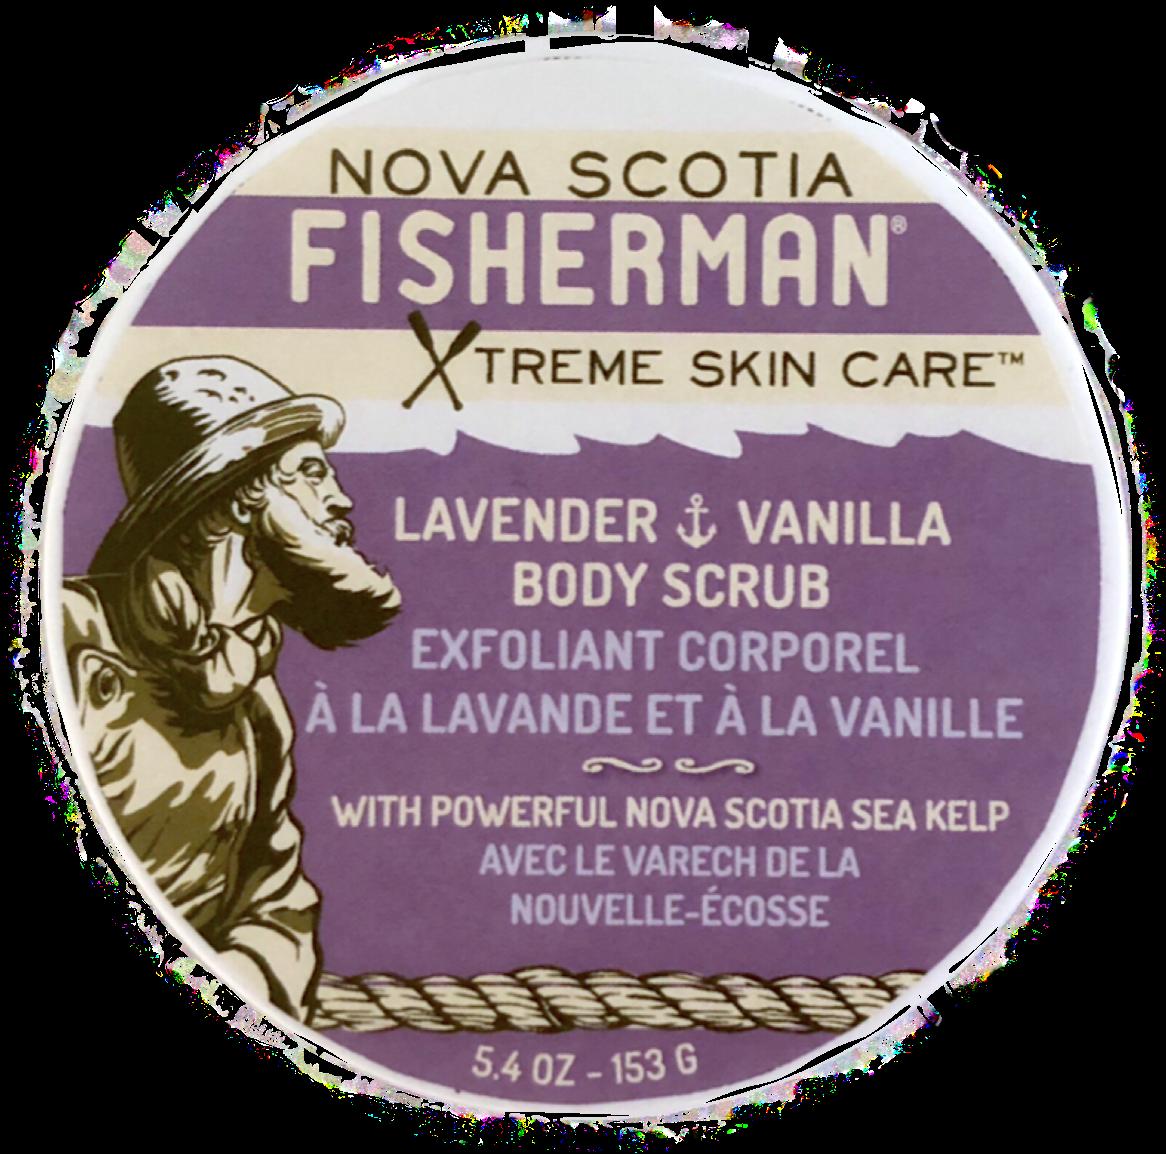 NOVA SCOTIA FISHERMAN(ノバスコシアフィッシャーマン) SALT-N-SEA BODY SCRUB ボディスクラブ ラベンダー&バニラ